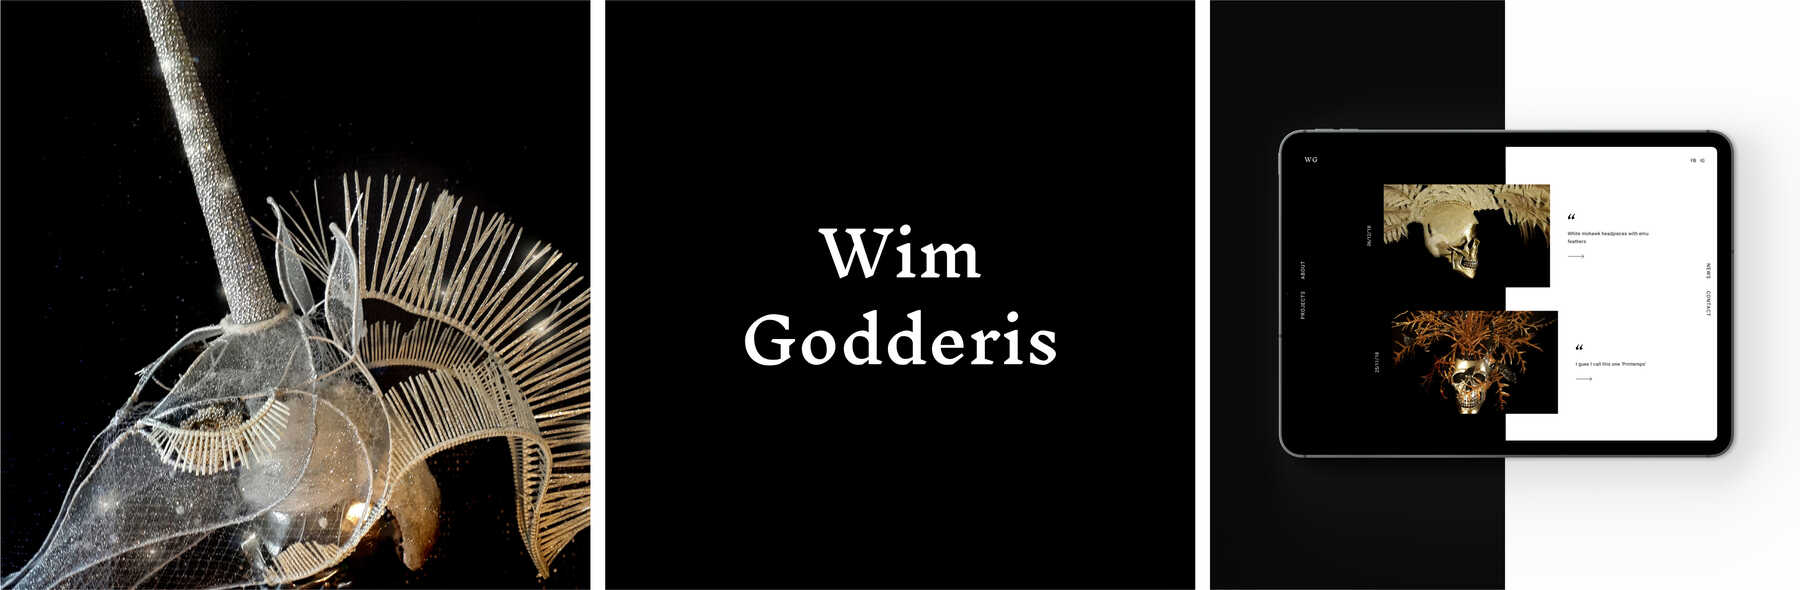 Wim Godderis branding